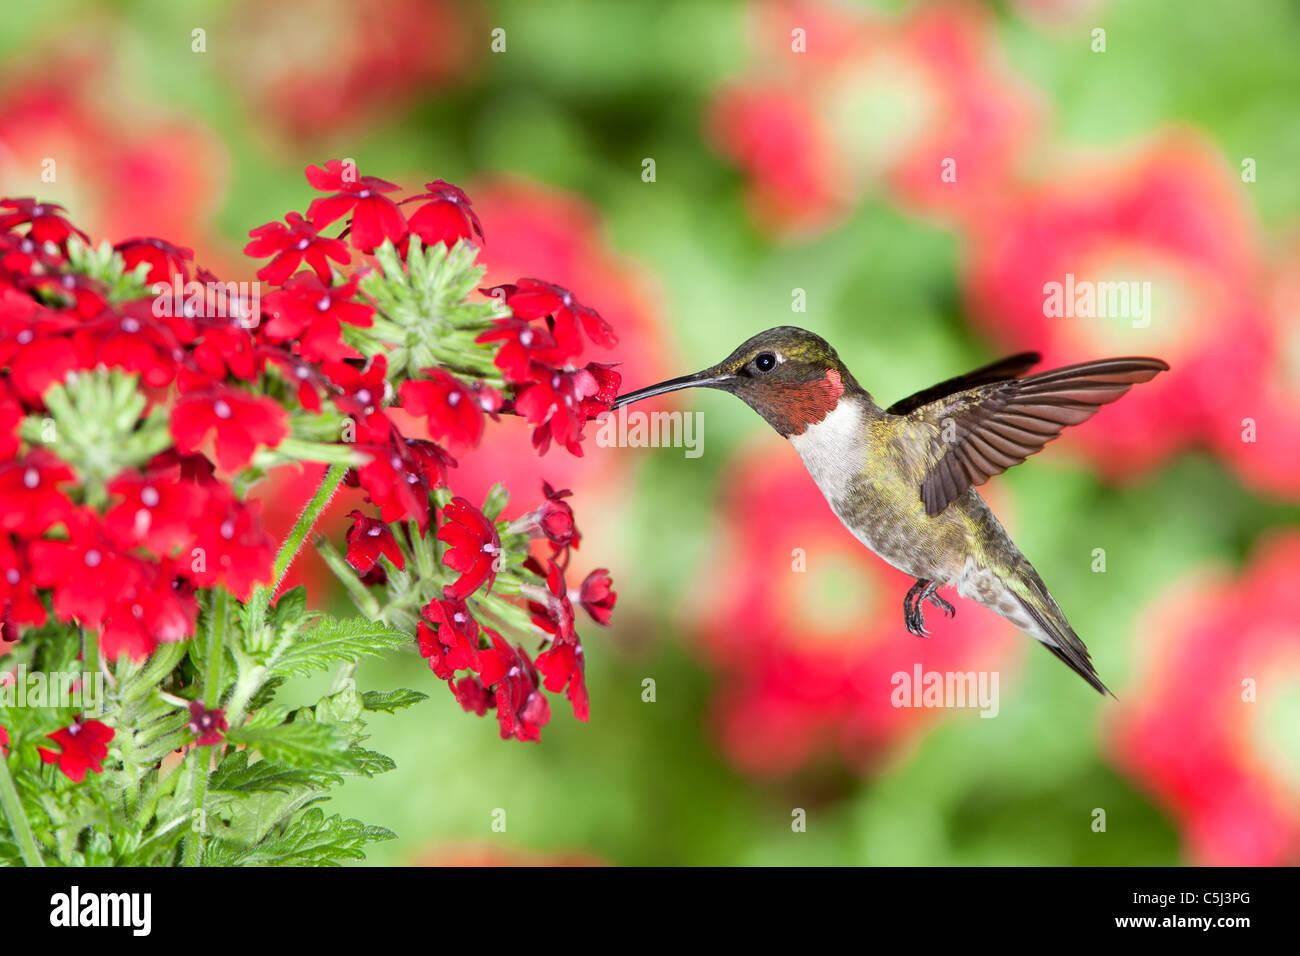 ruby throated hummingbird seeking nectar from verbena flowers